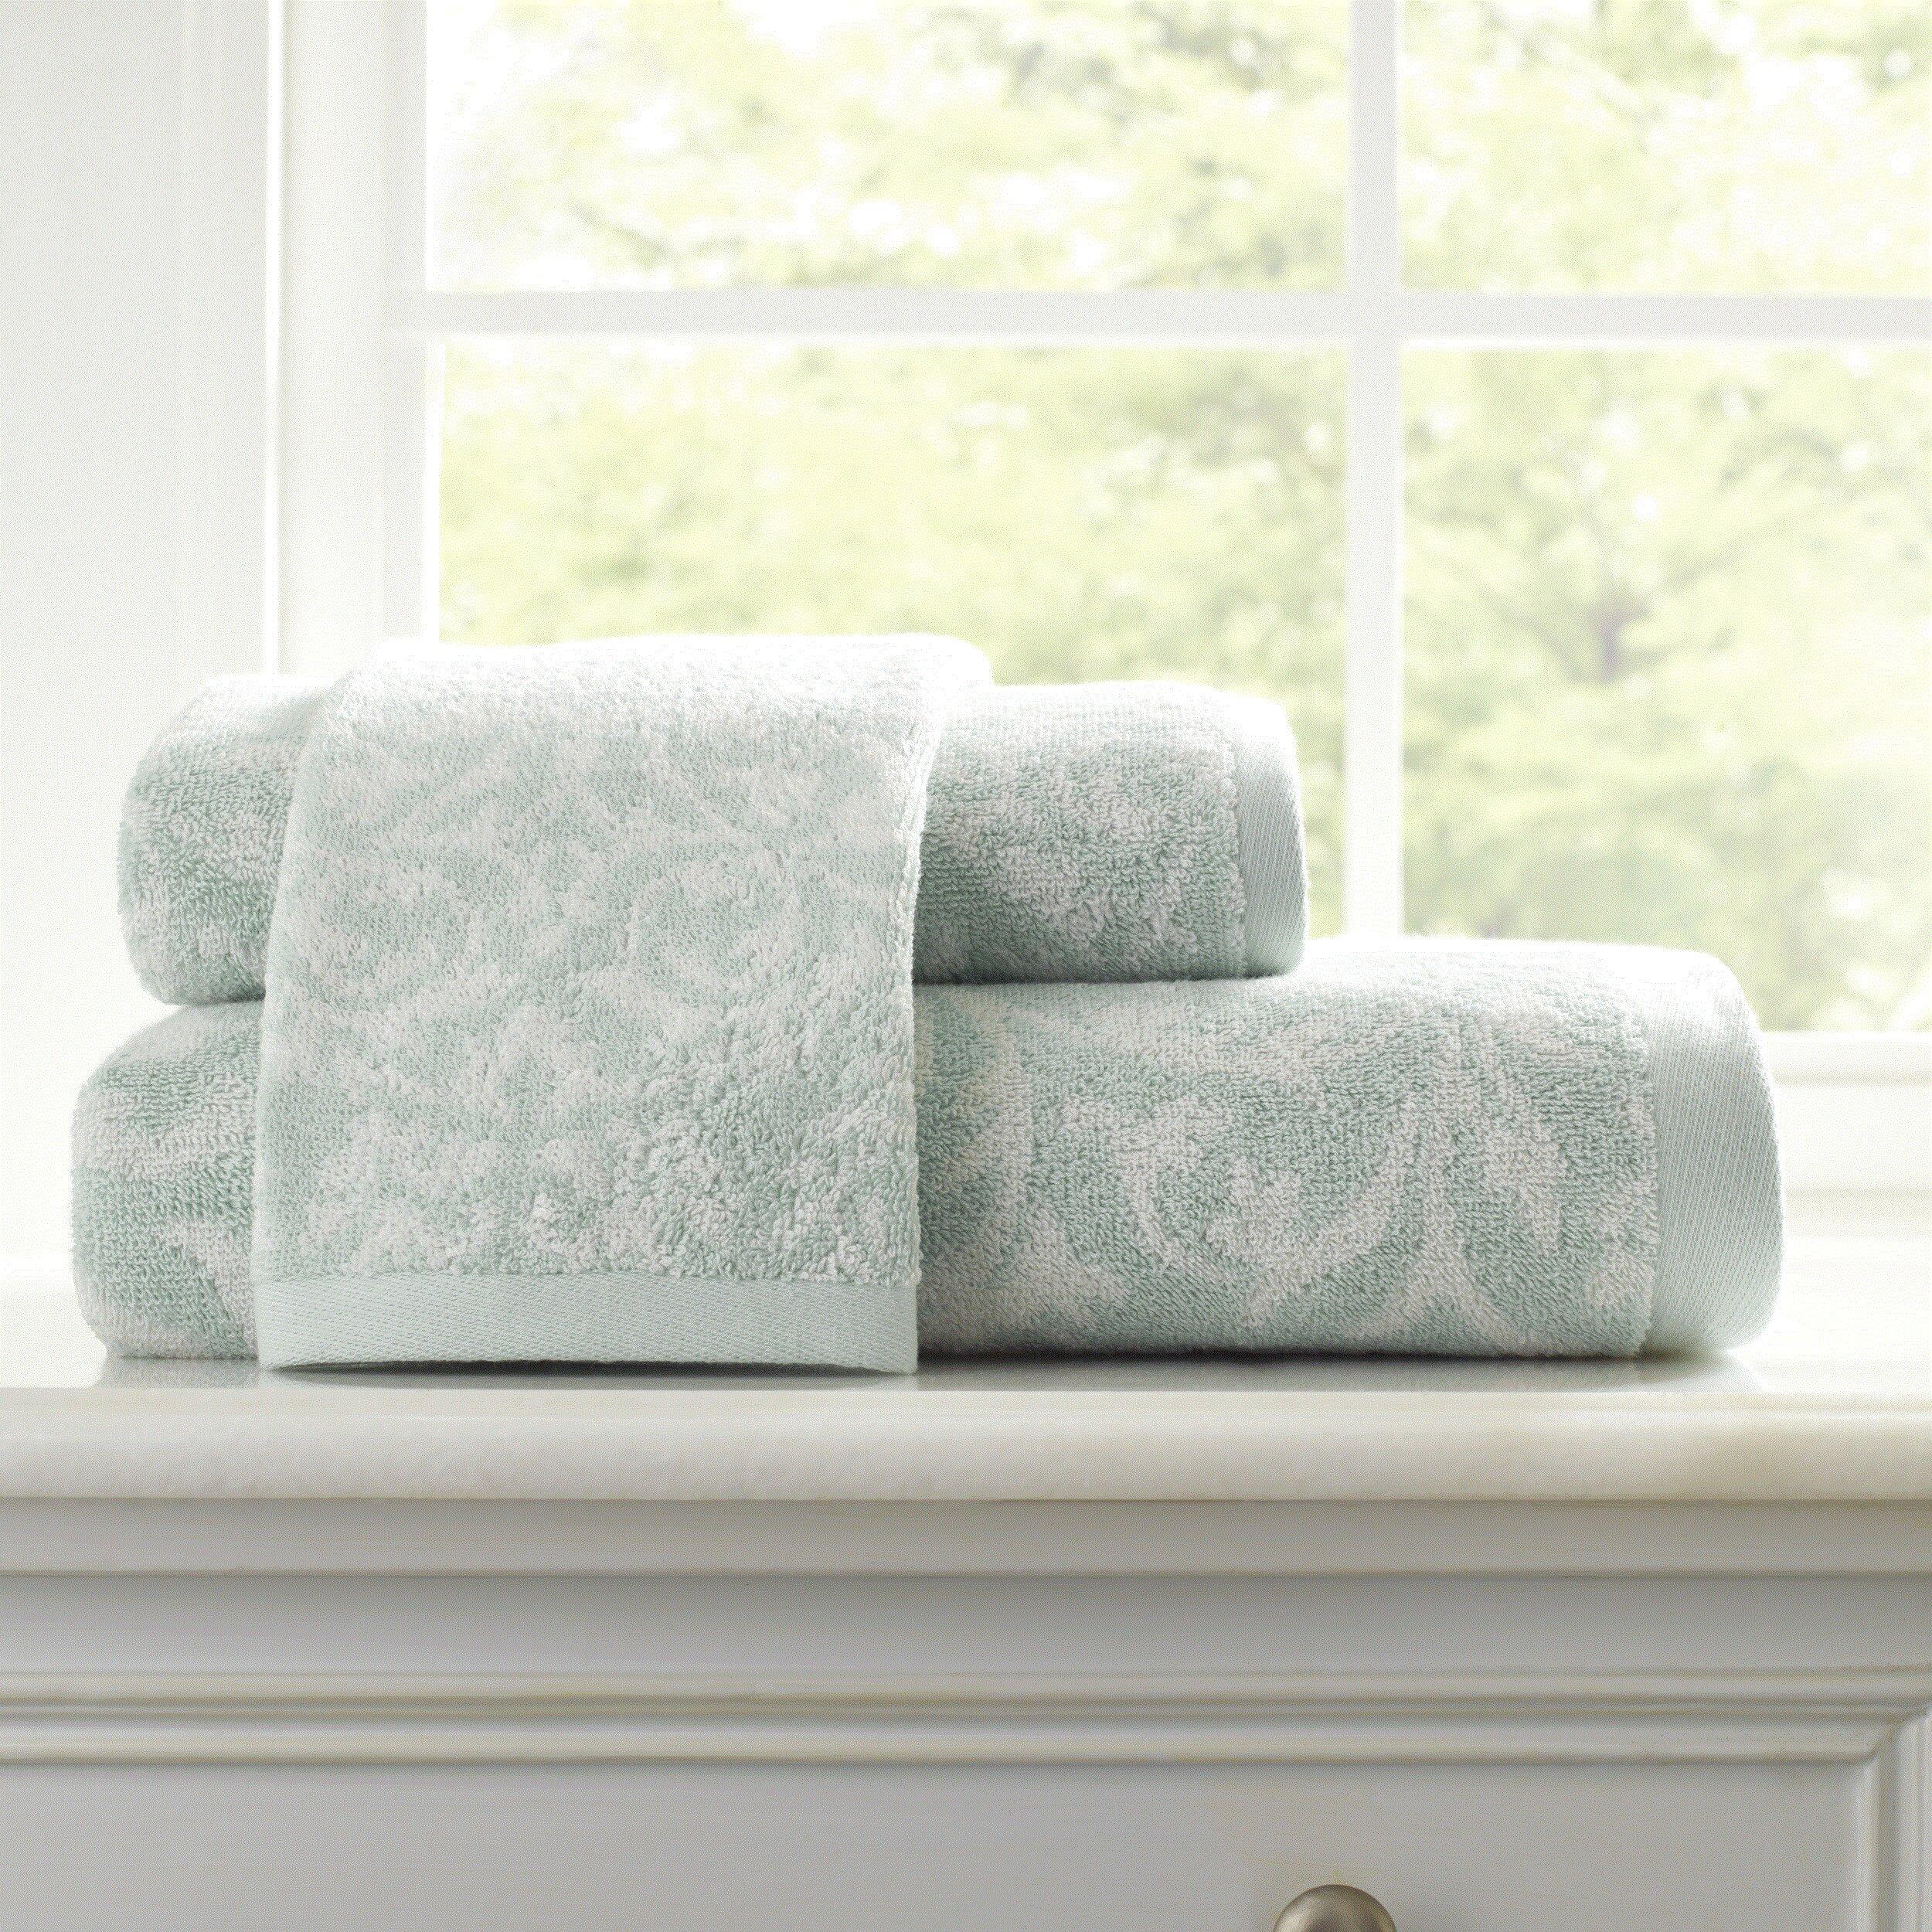 Laura Ashley Home Avery Damask Jacquard 3 Piece Towels Set Allmodern